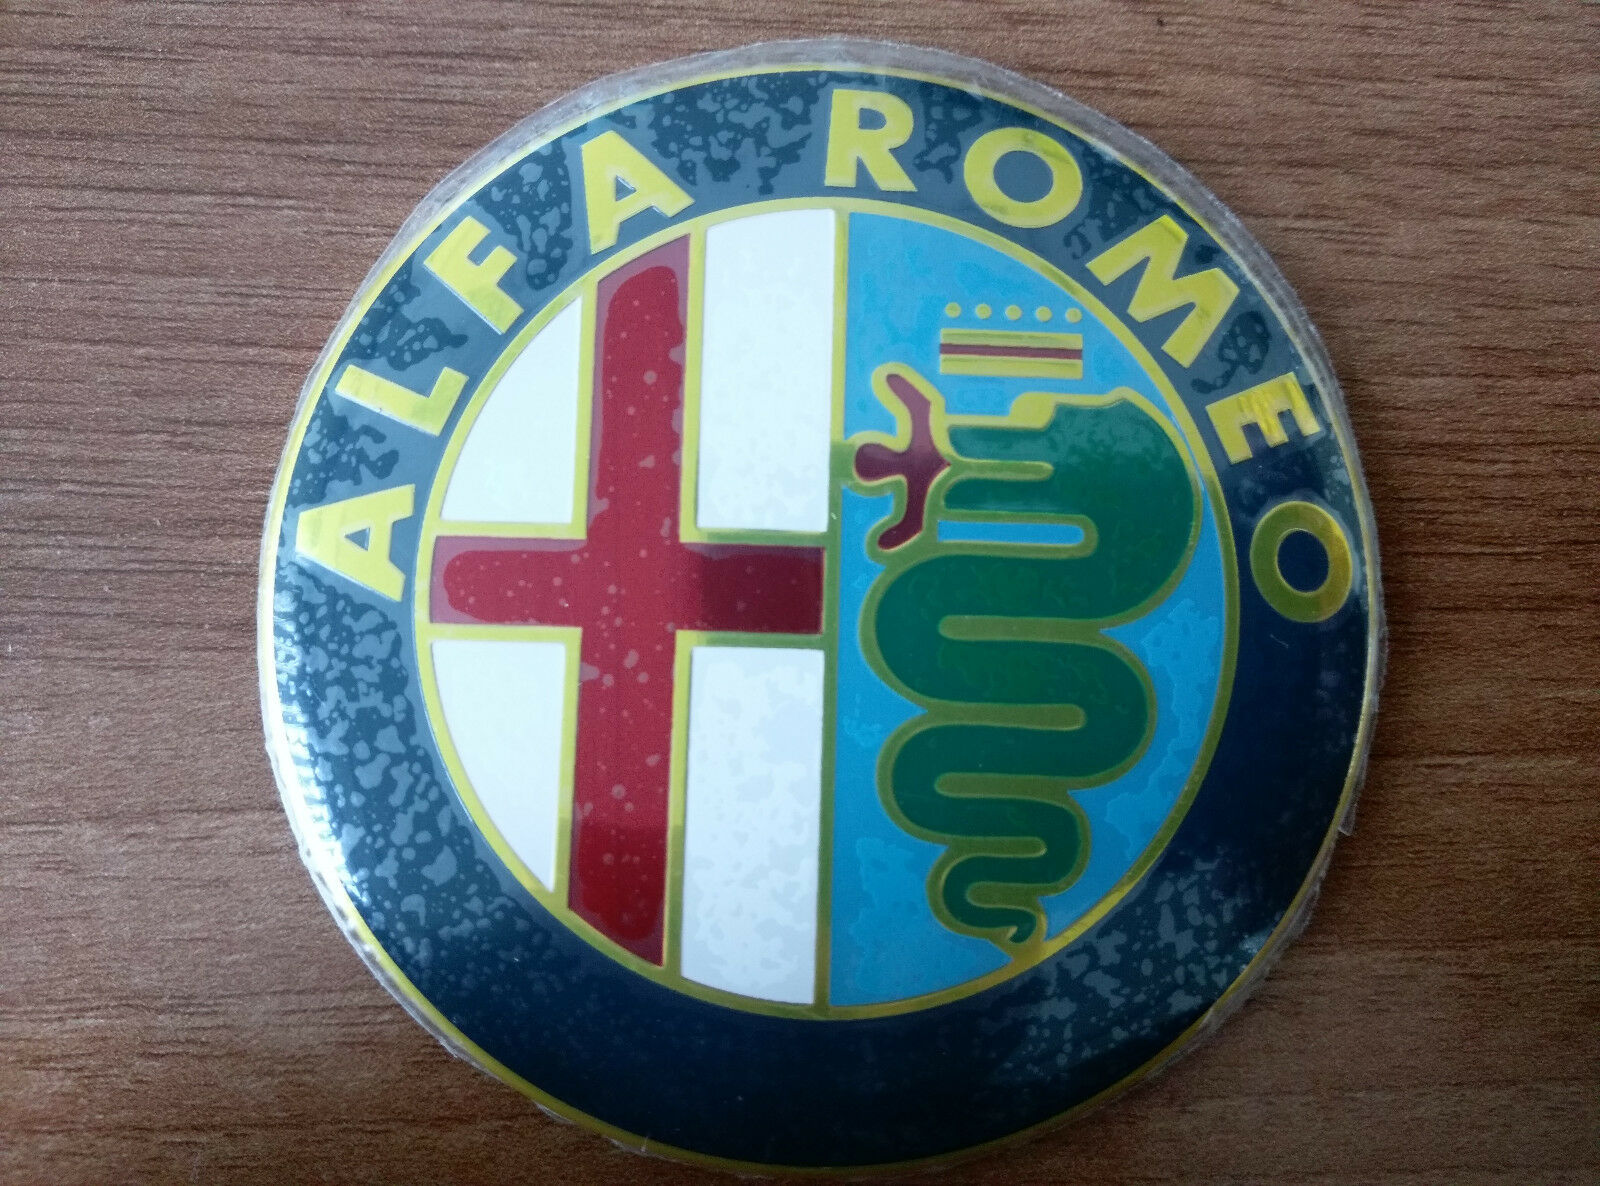 Alfa Romeo Color Emblem Badge Logo Insignia 74mm For 145 146 147155 159 166 Sale